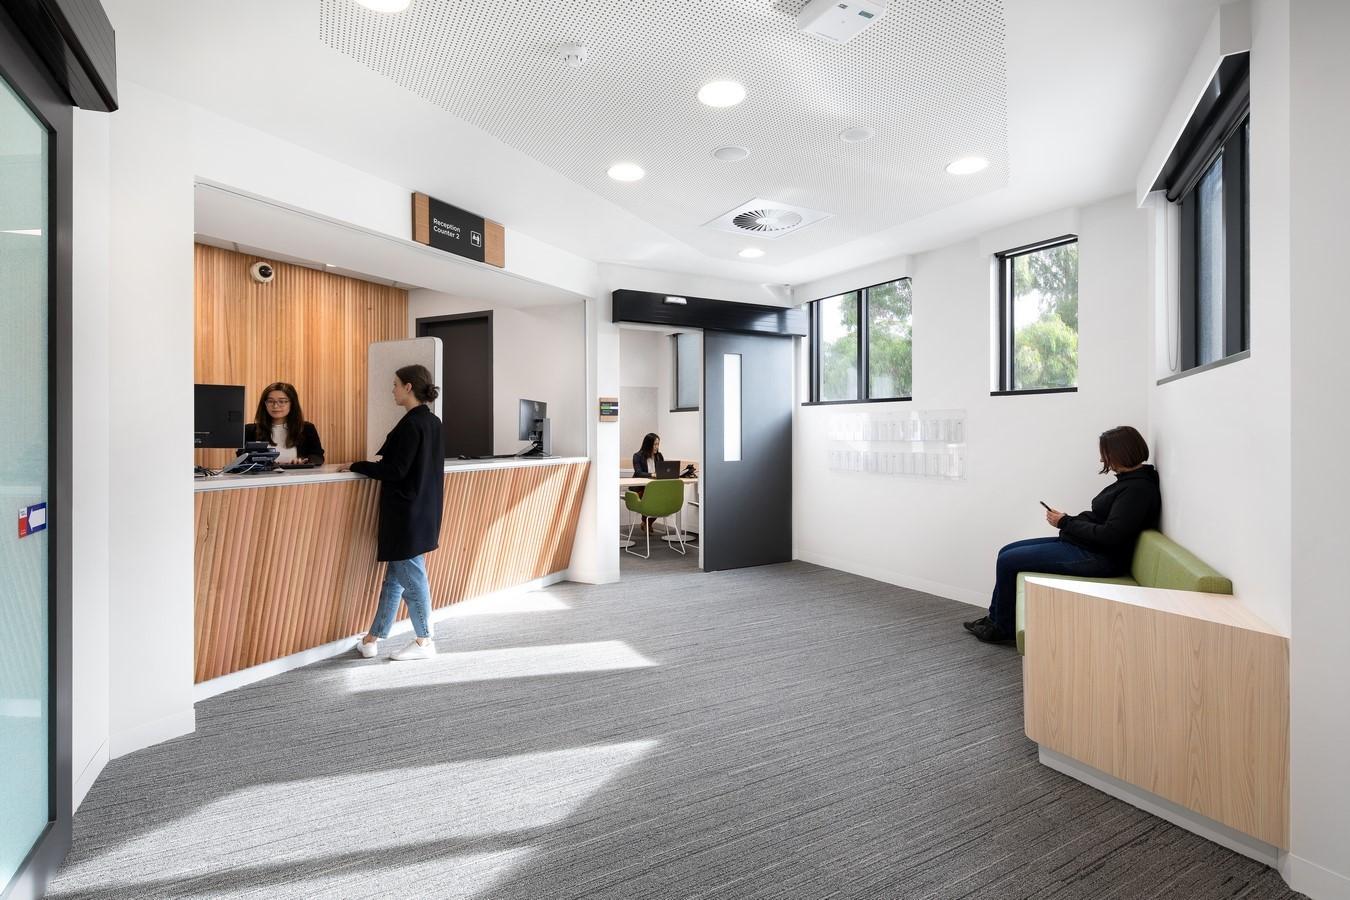 Court Services Australia By Billard Leece Partnership - Sheet1